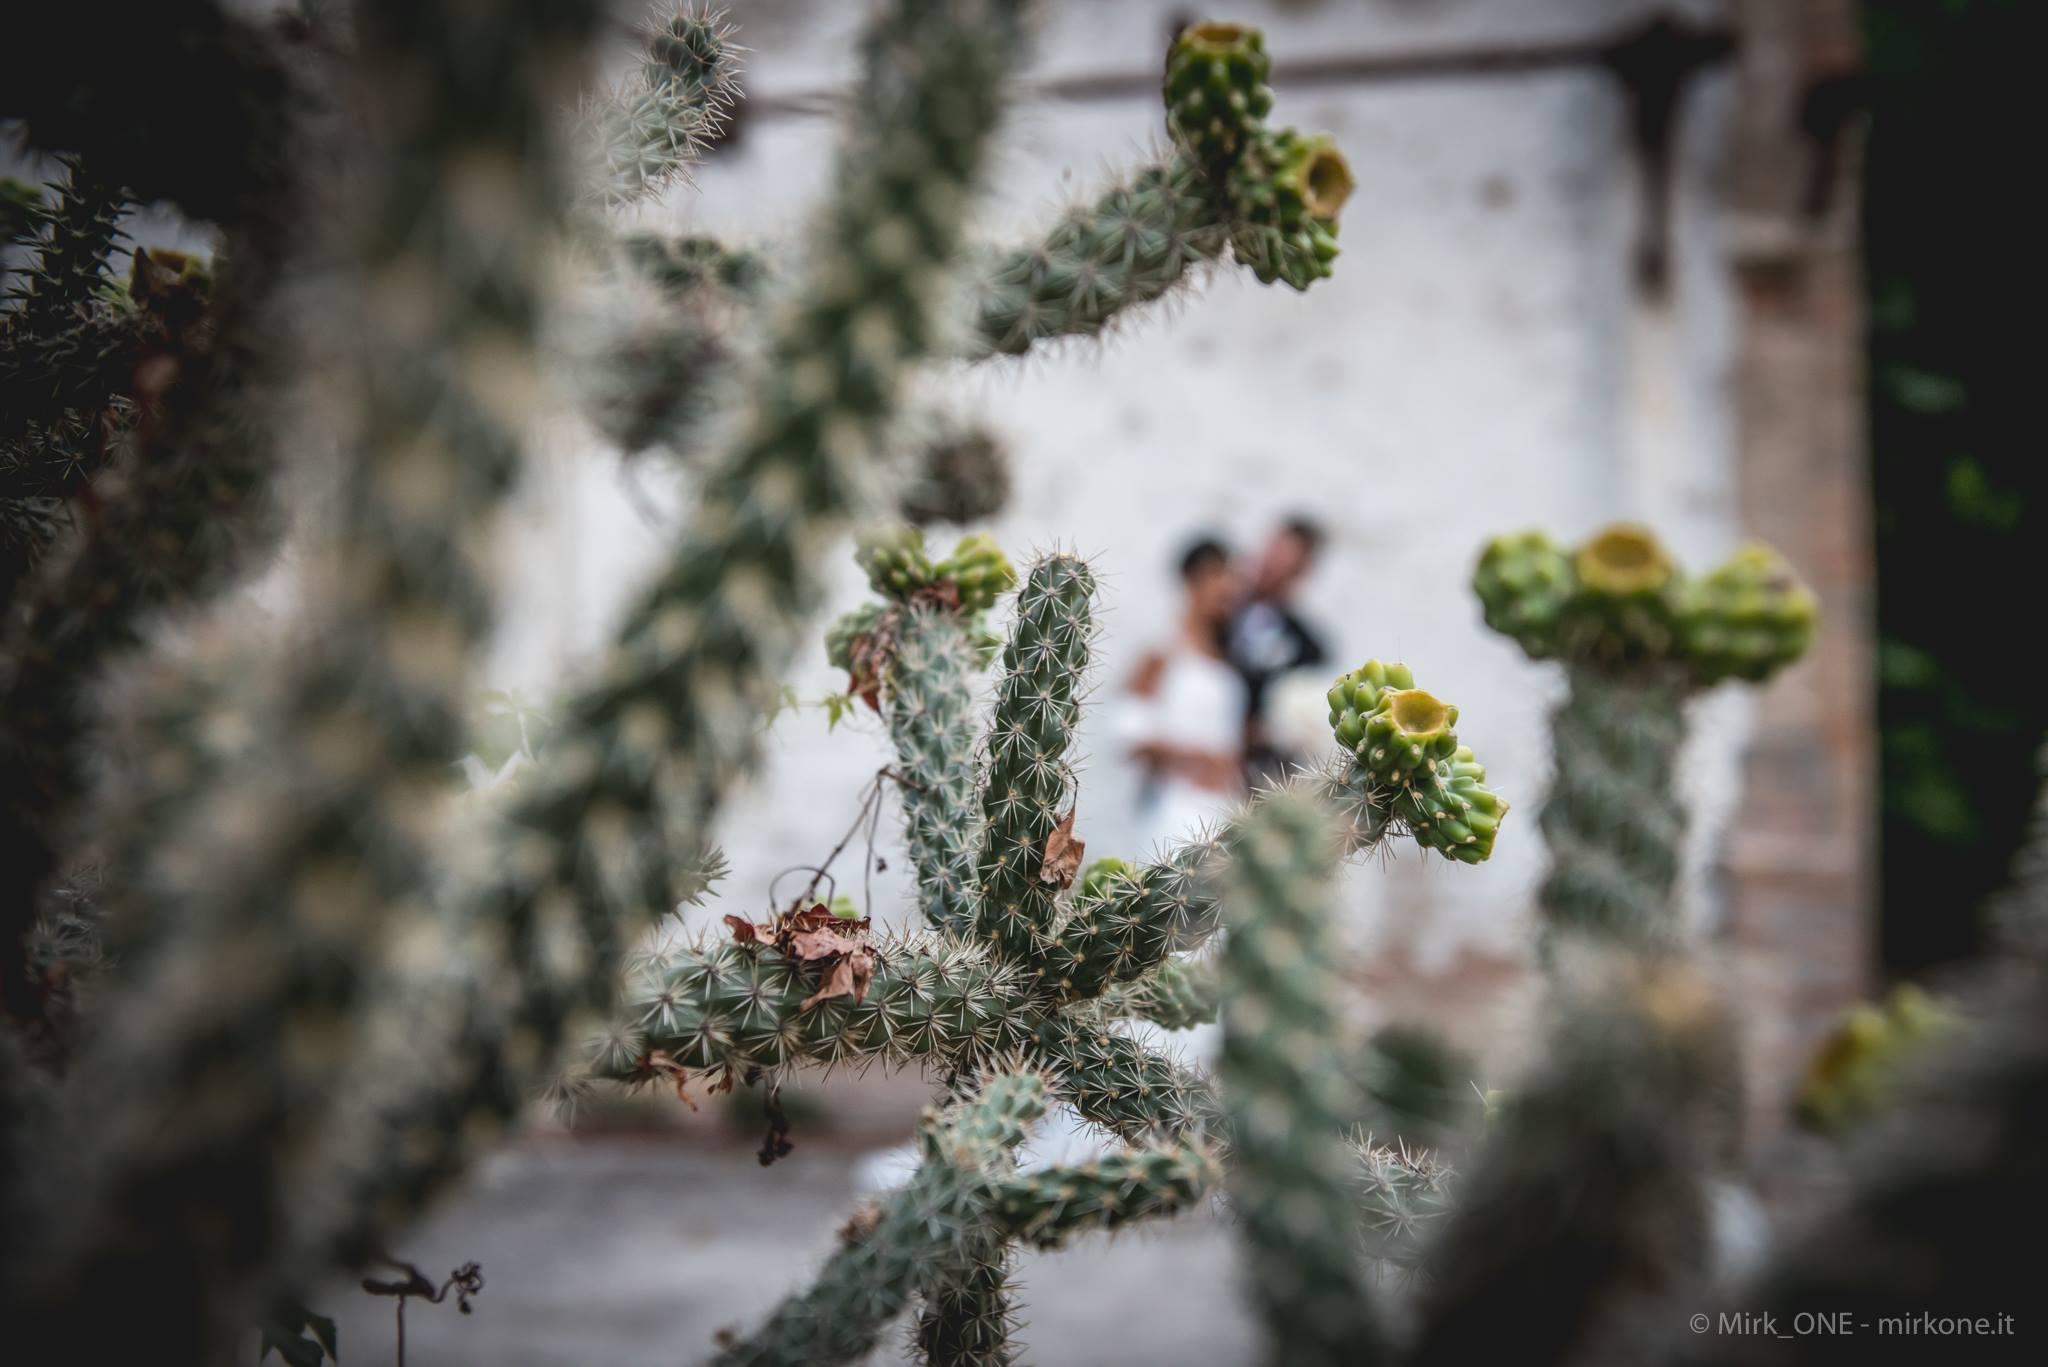 https://lnx.mirkone.it/wp-content/uploads/2015/07/mirk_ONE-fotografo-matrimonio-00116.jpg